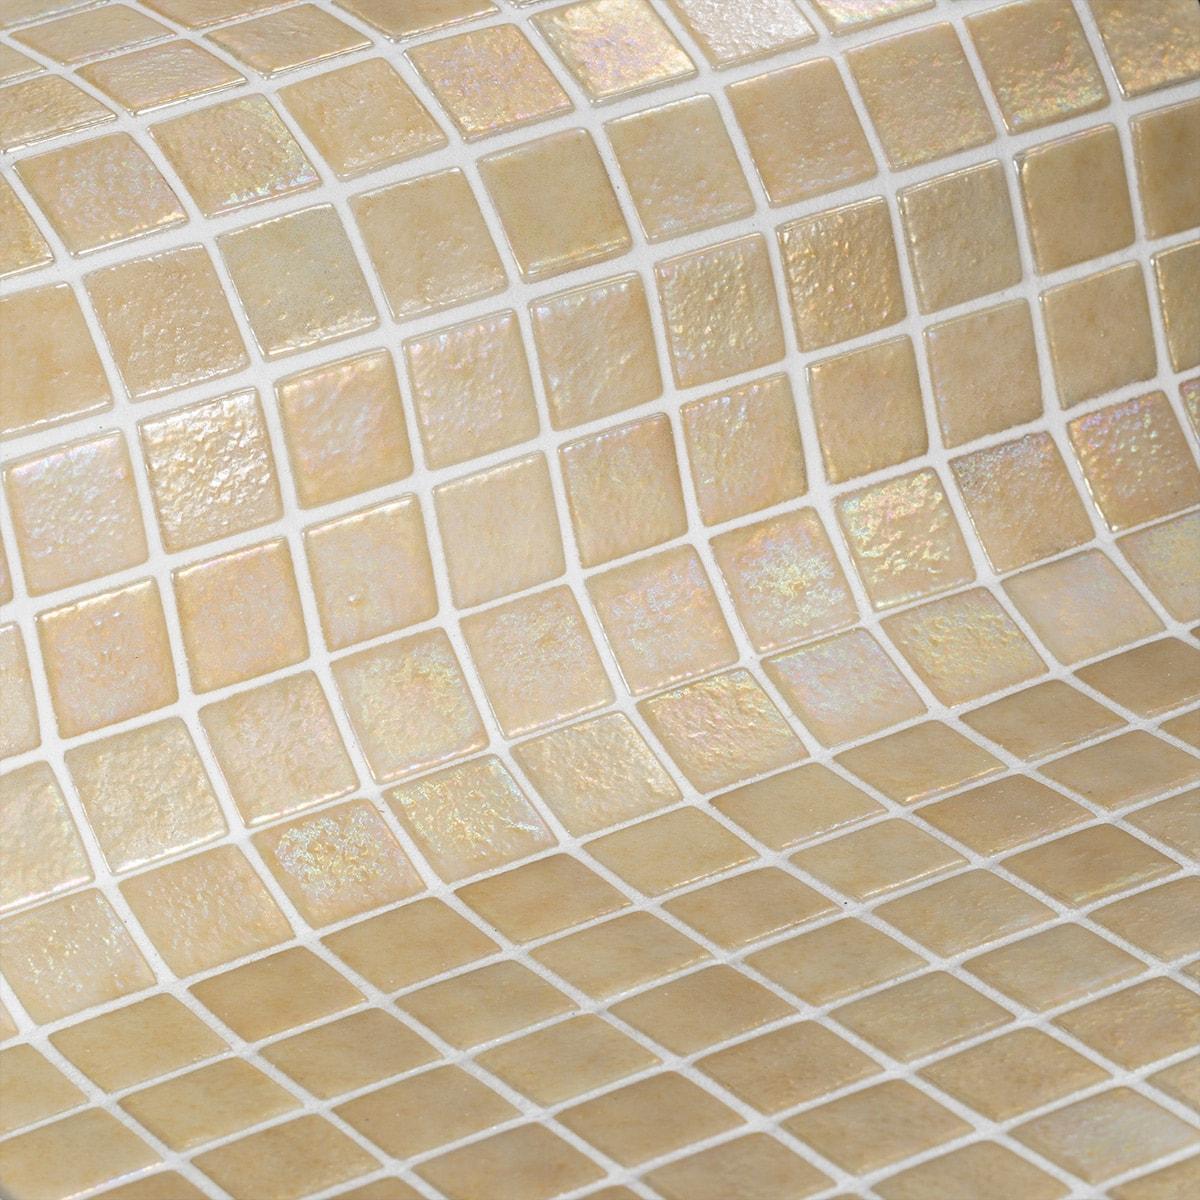 Arena-Safe-Safe-steps-Mosaic-Ezarri.jpg